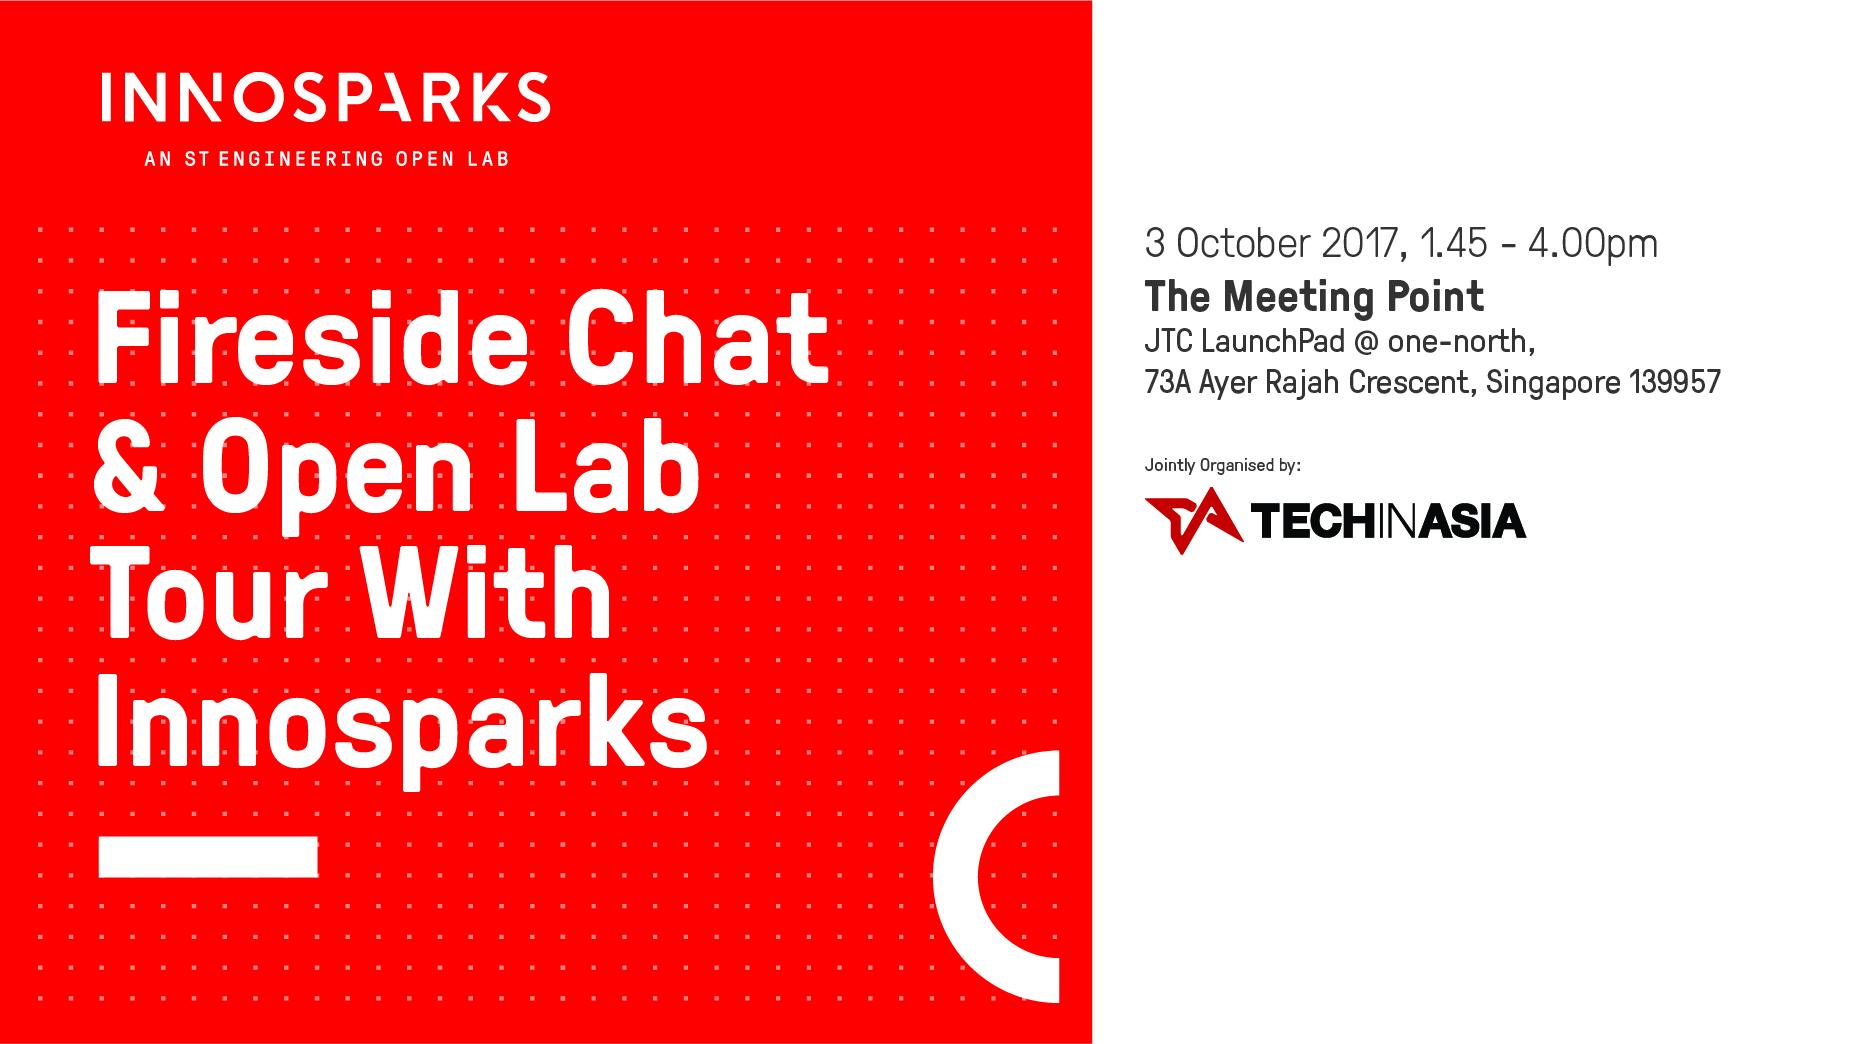 https://cdn.techinasia.com/wp-content/uploads/2017/09/innosparks-header-image3.jpg